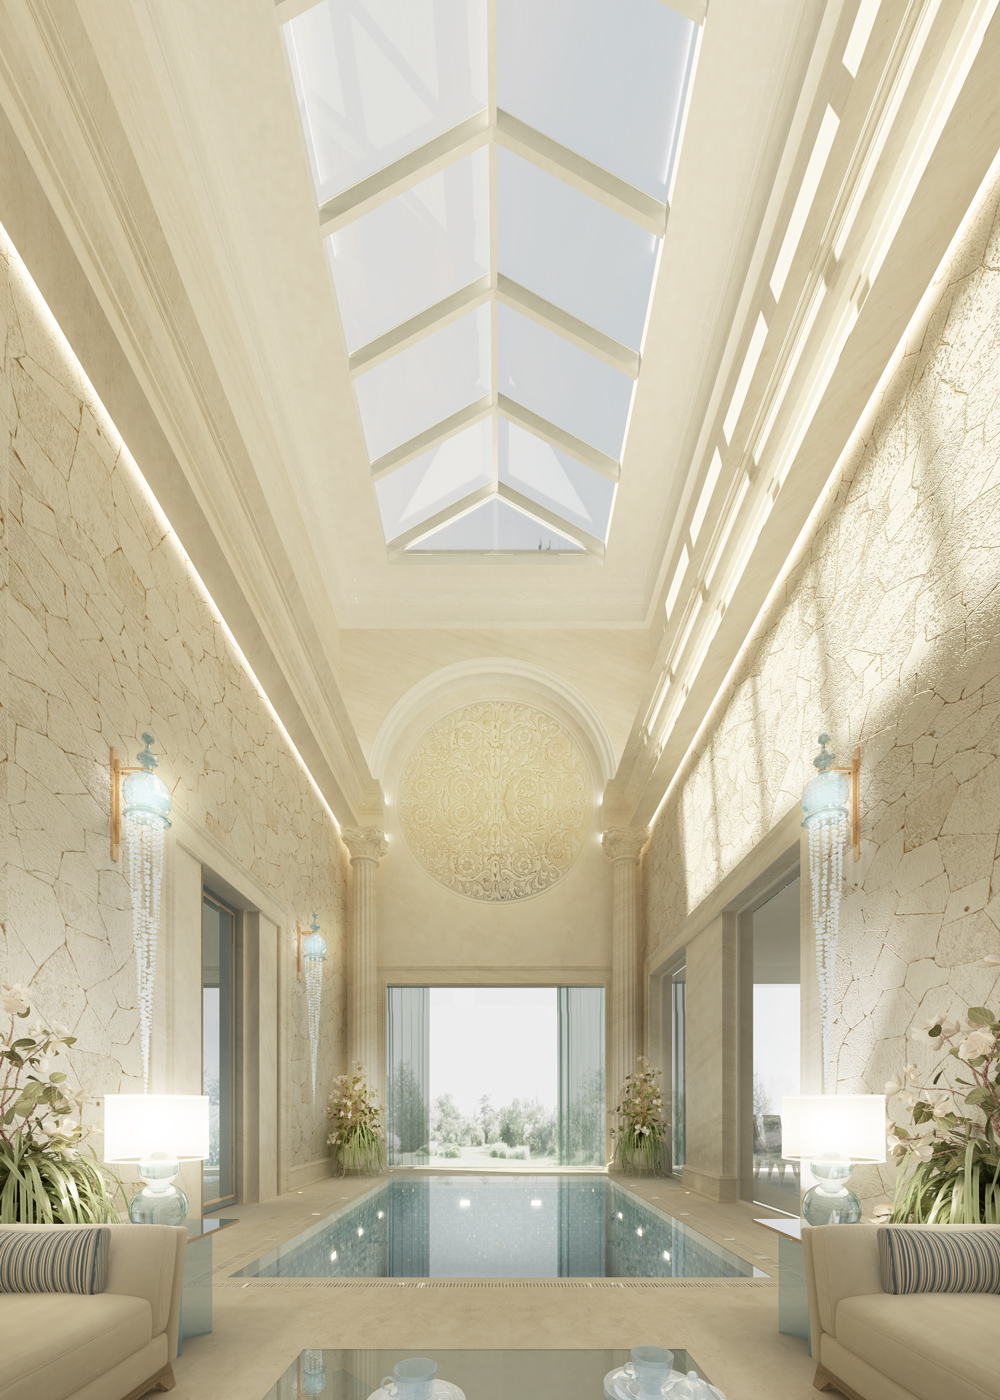 Luxury  Pool for your Villa Design